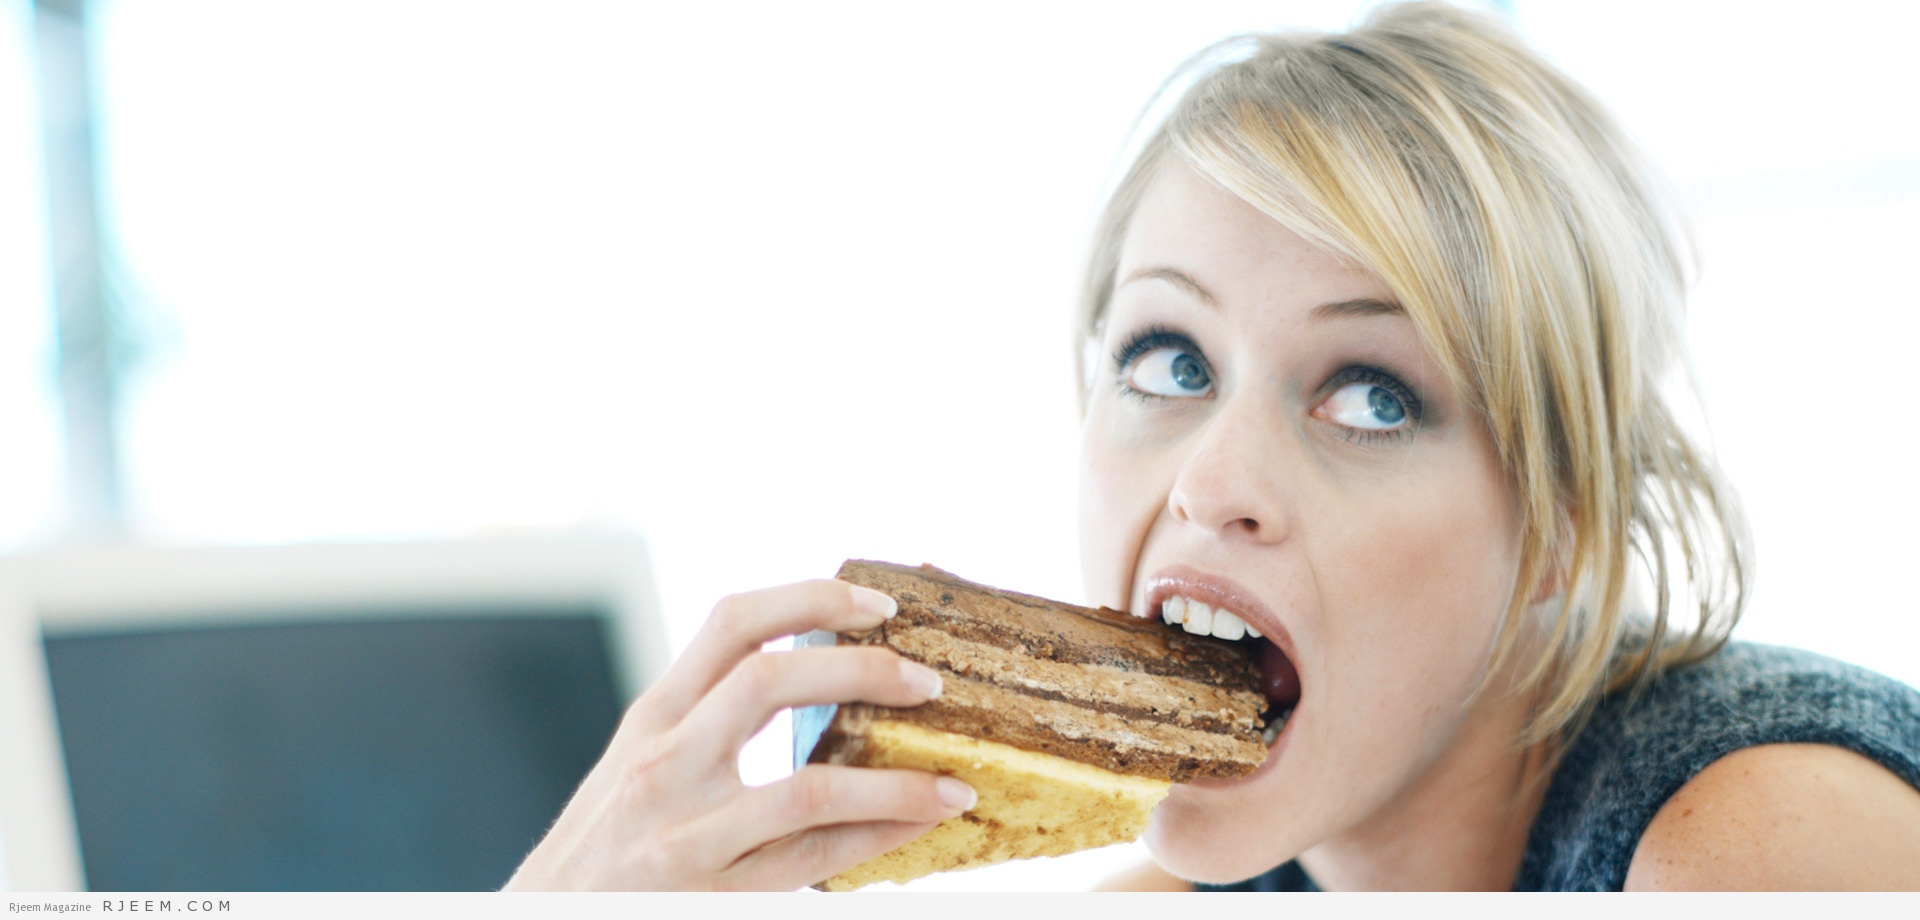 Photo of ماذا سيحدث لجسمك إذا توقفت عن تناول السكريات 3 أيام؟